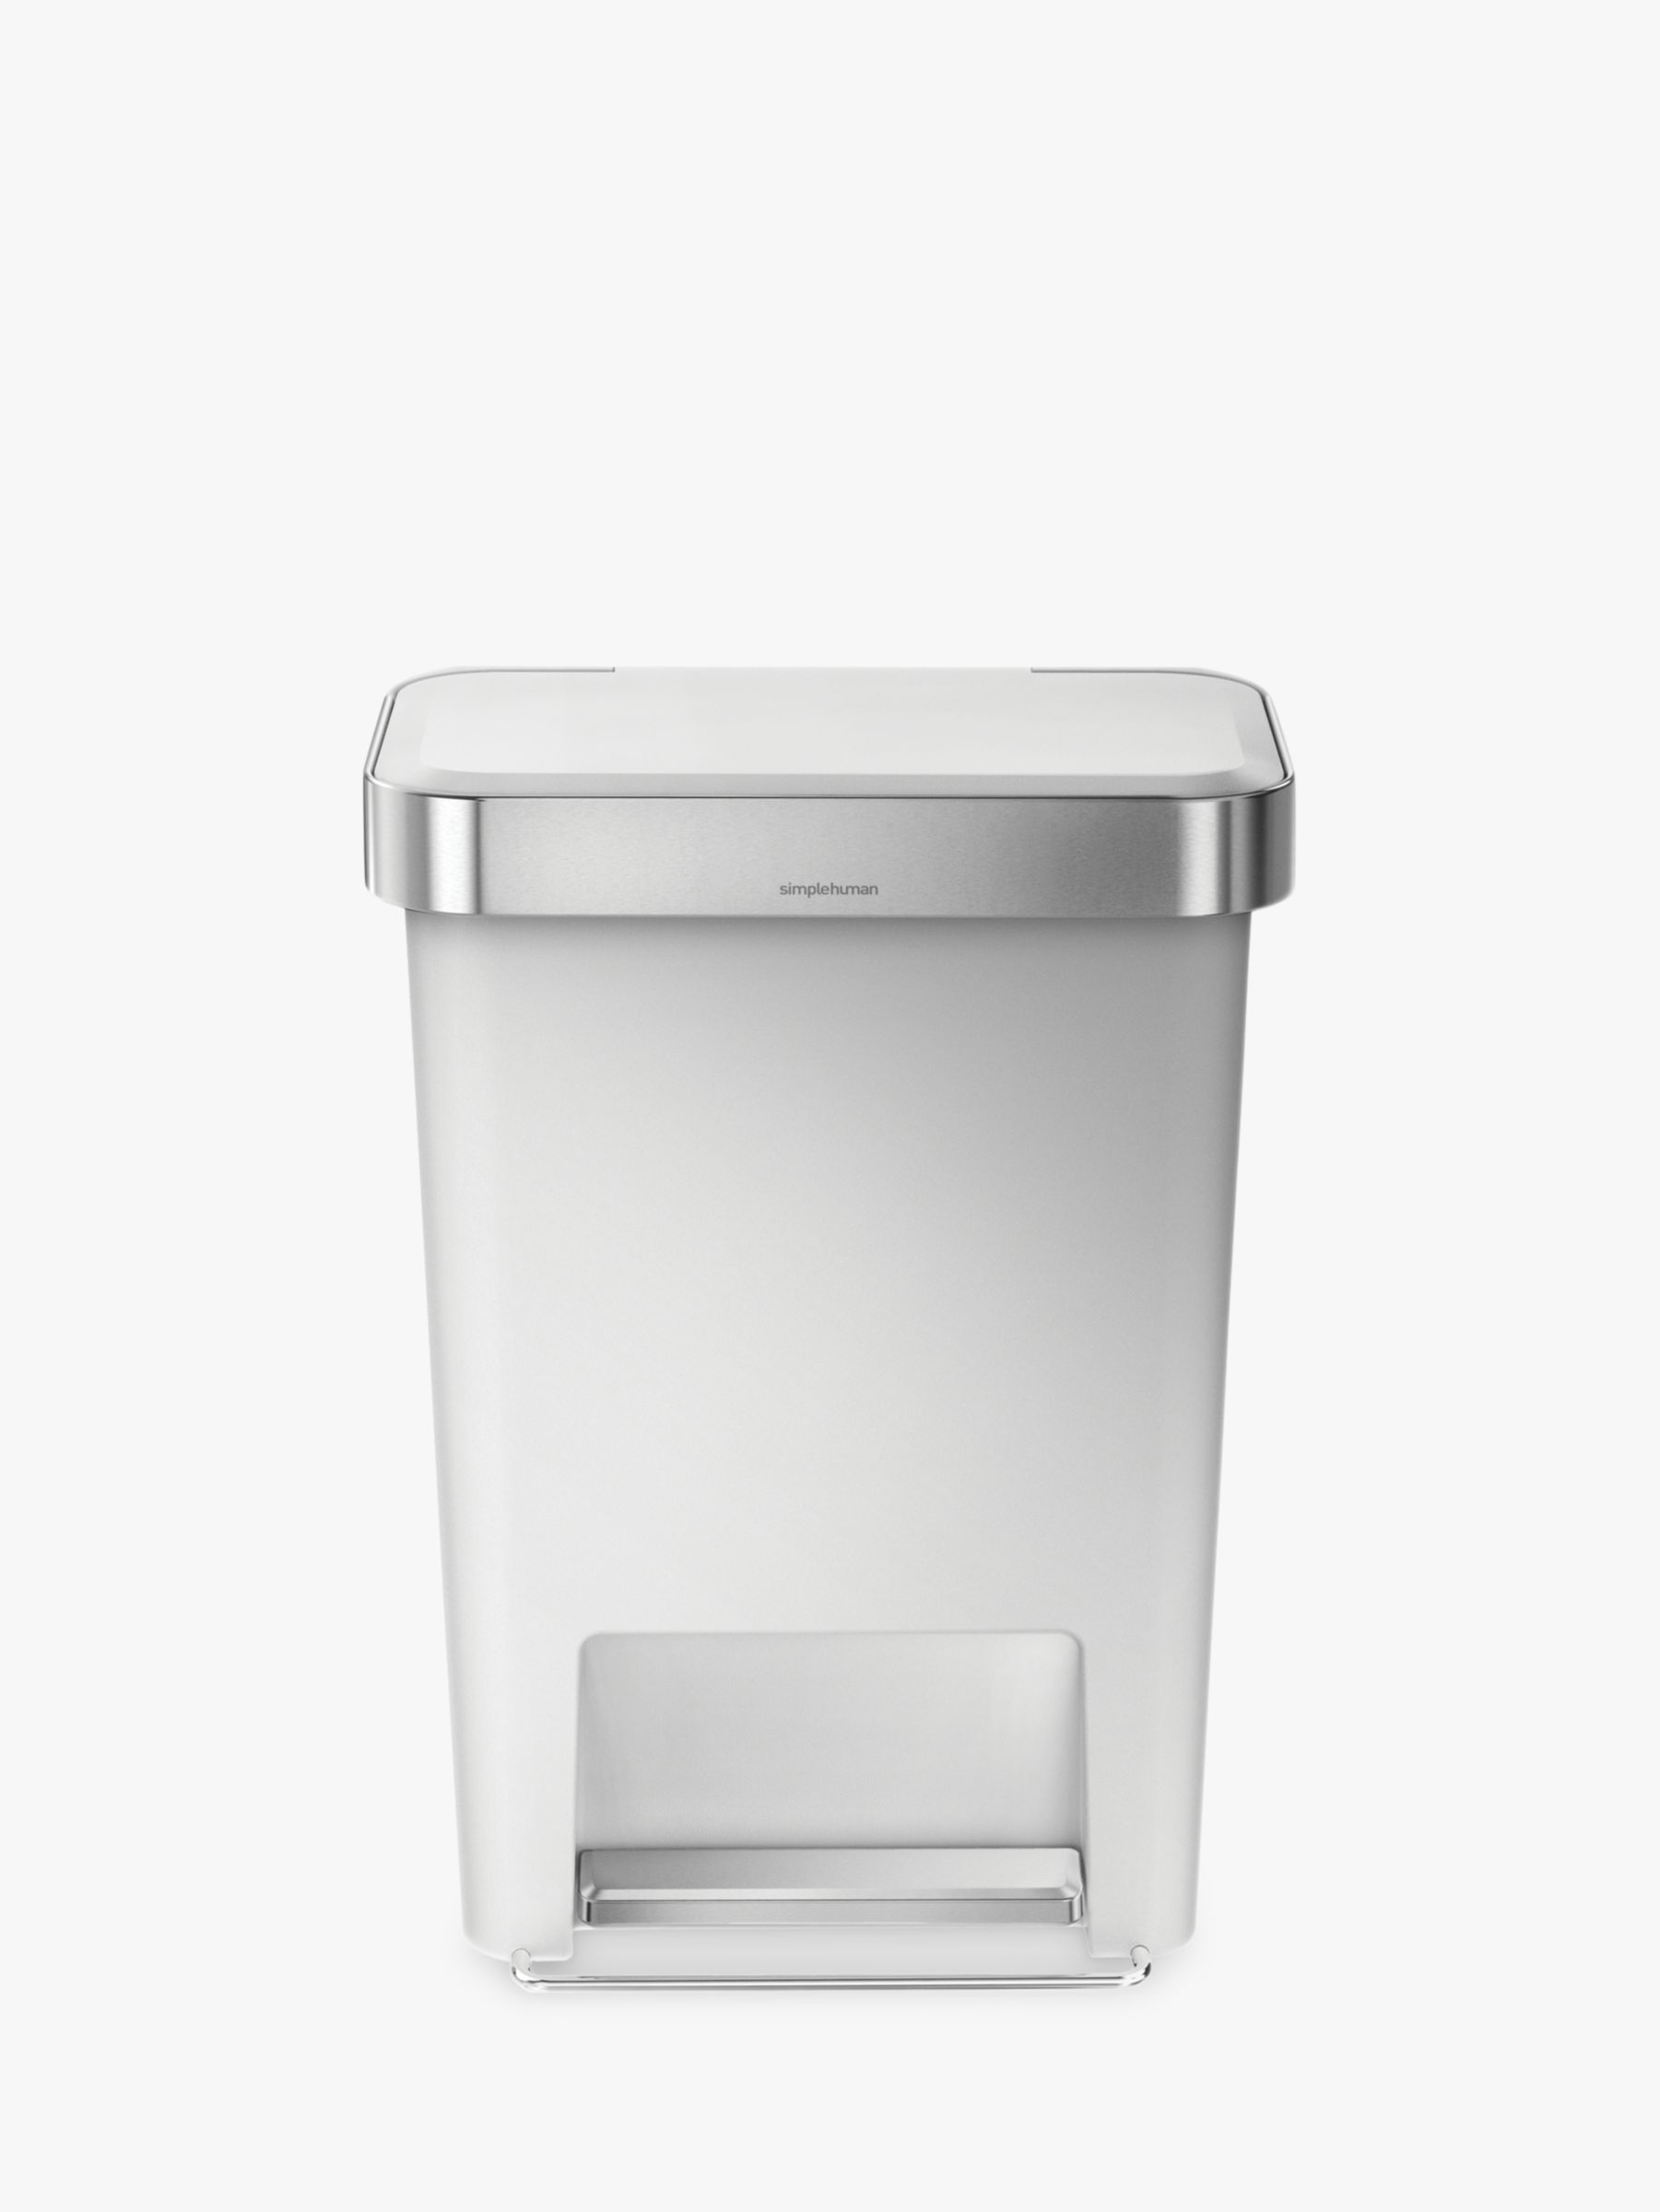 Simplehuman simplehuman Liner Pocket Pedal Bin, 45L